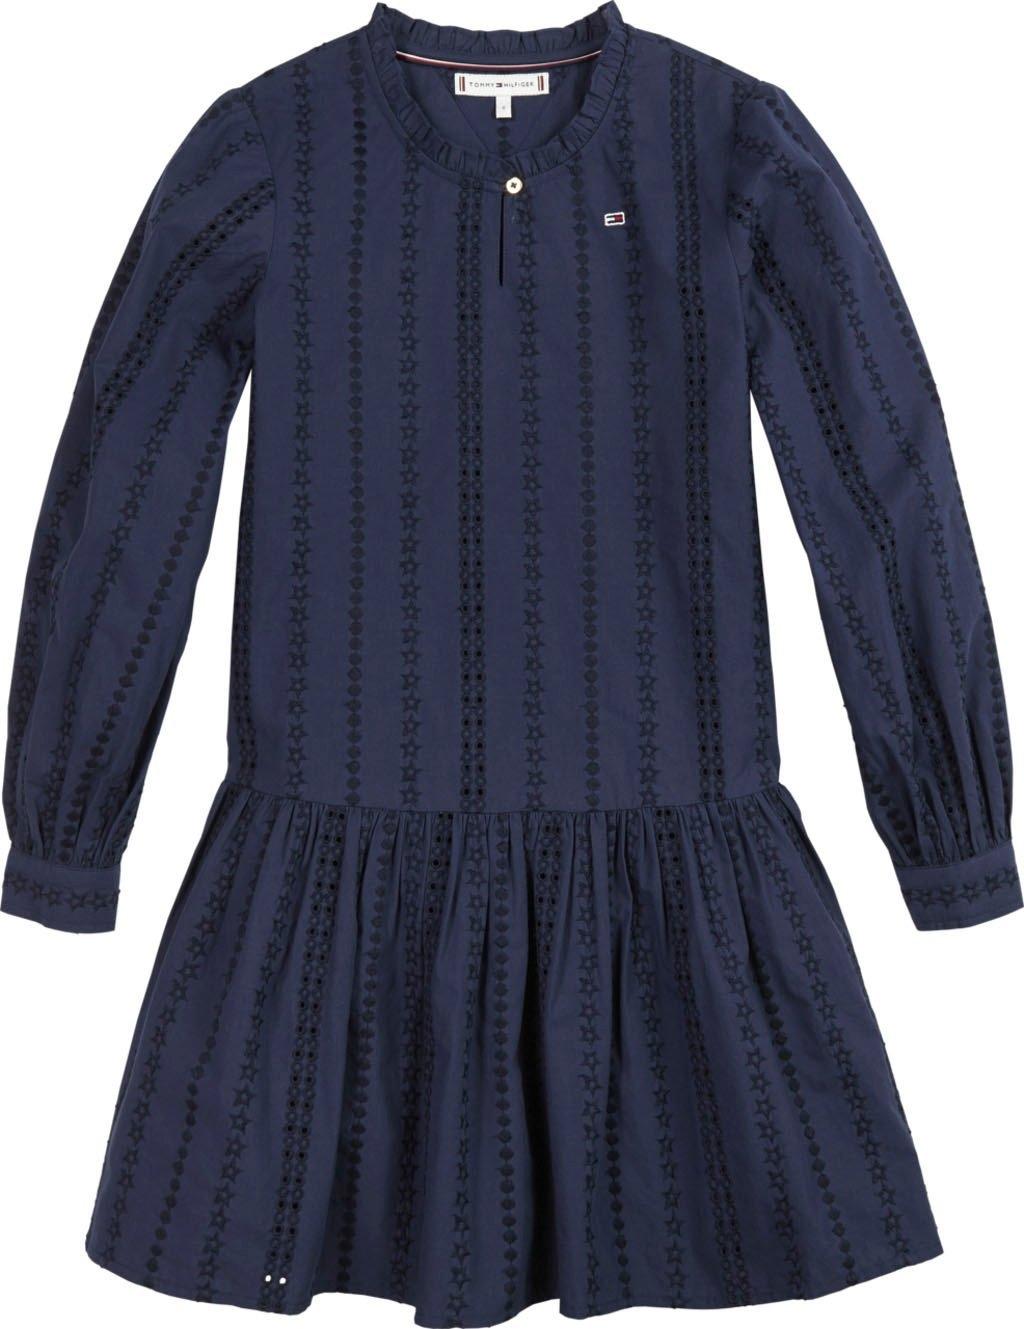 Tommy Hilfiger jurk in a-lijn nu online bestellen